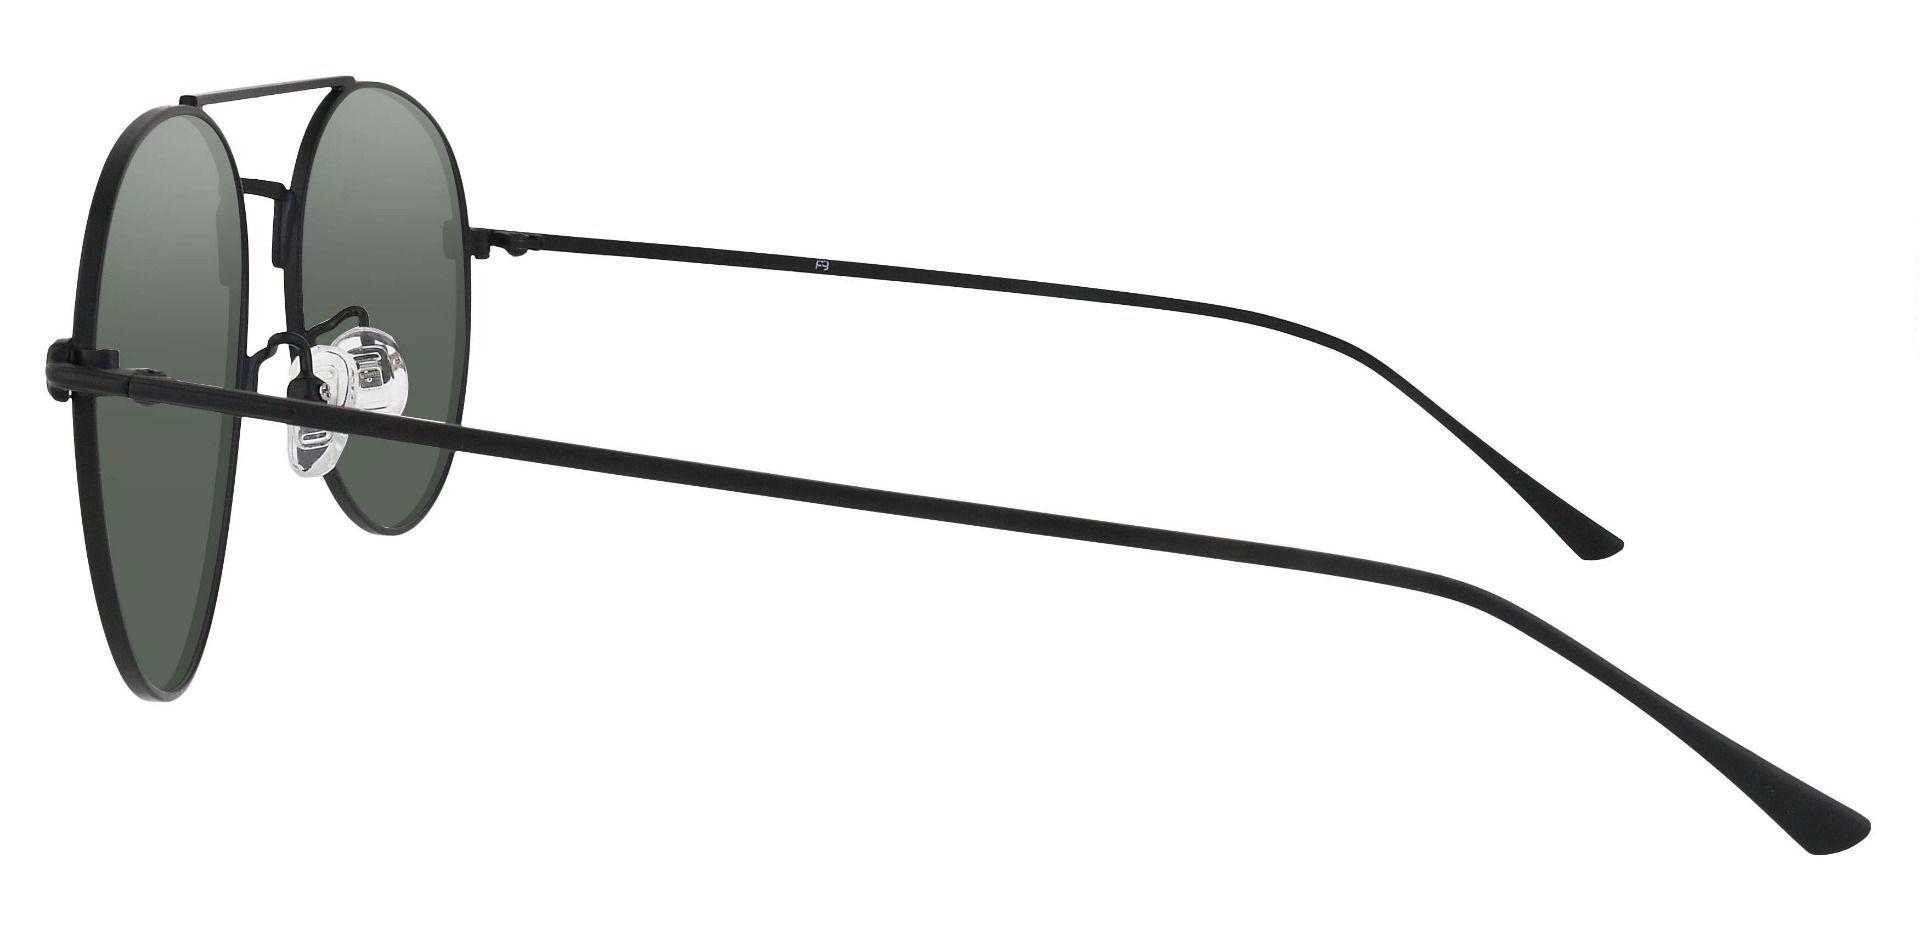 Canon Aviator Reading Sunglasses - Black Frame With Green Lenses